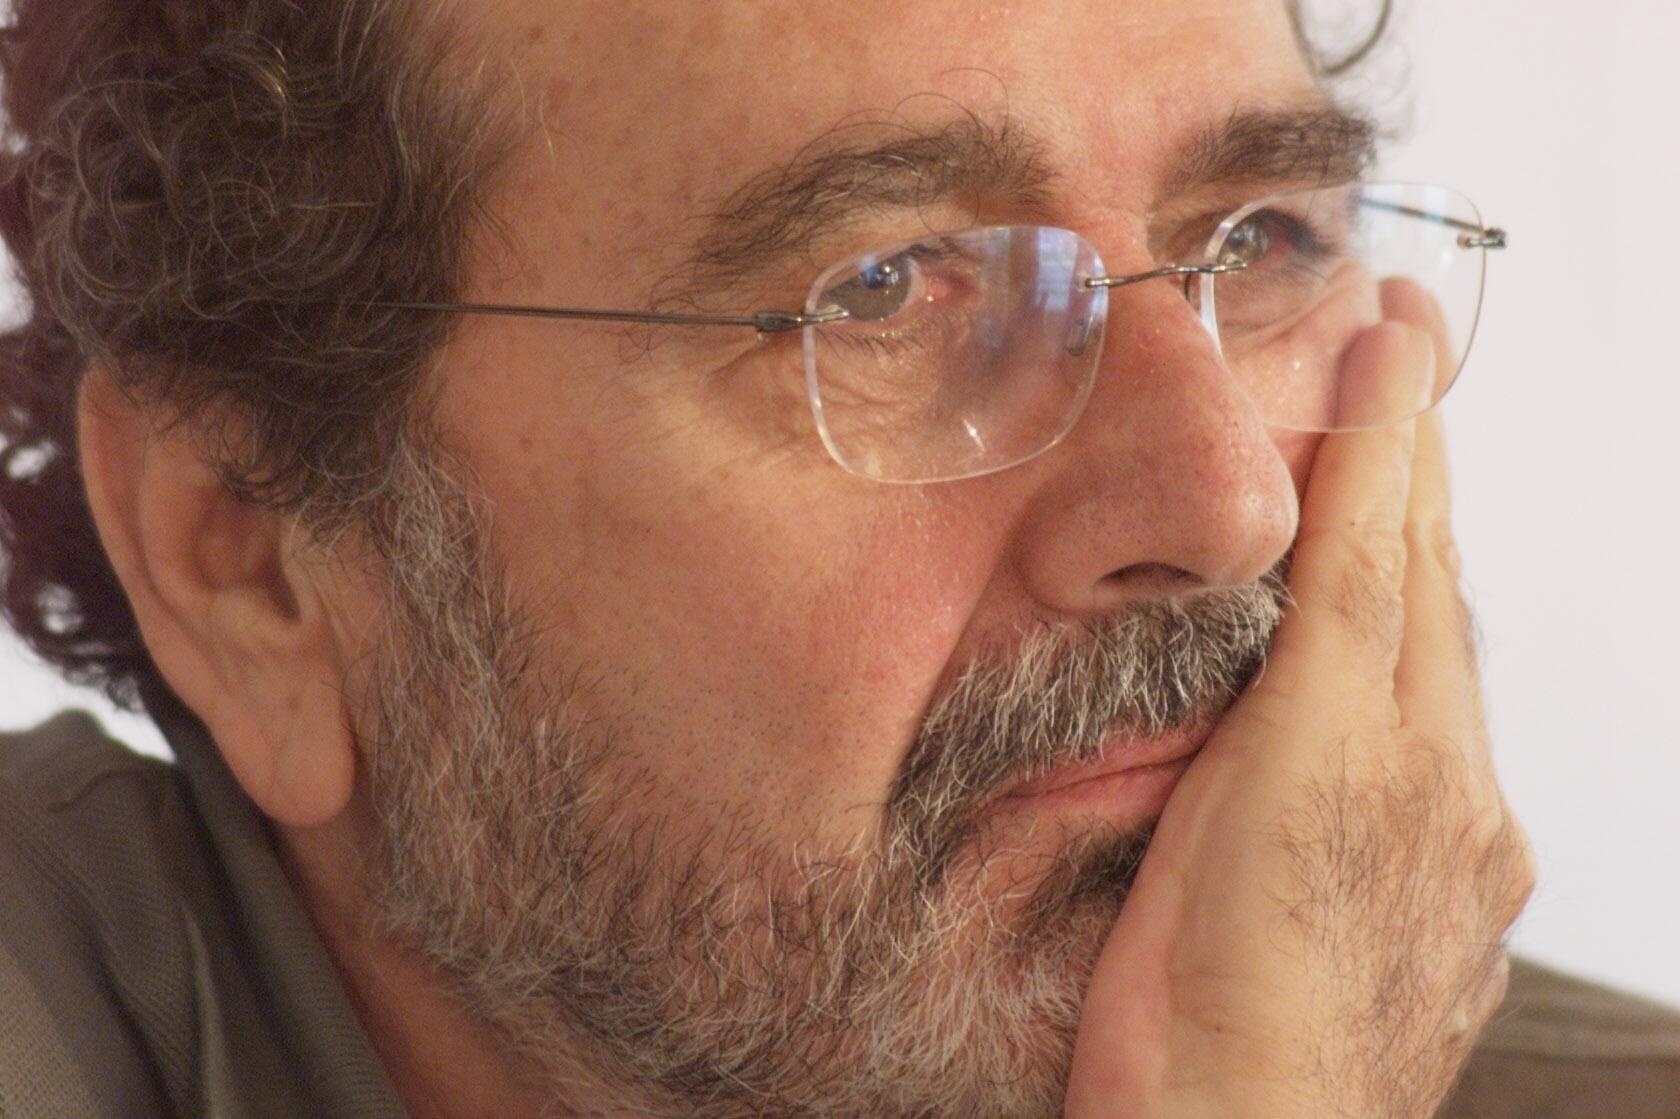 Carlos Diegues, cineasta brasileiro